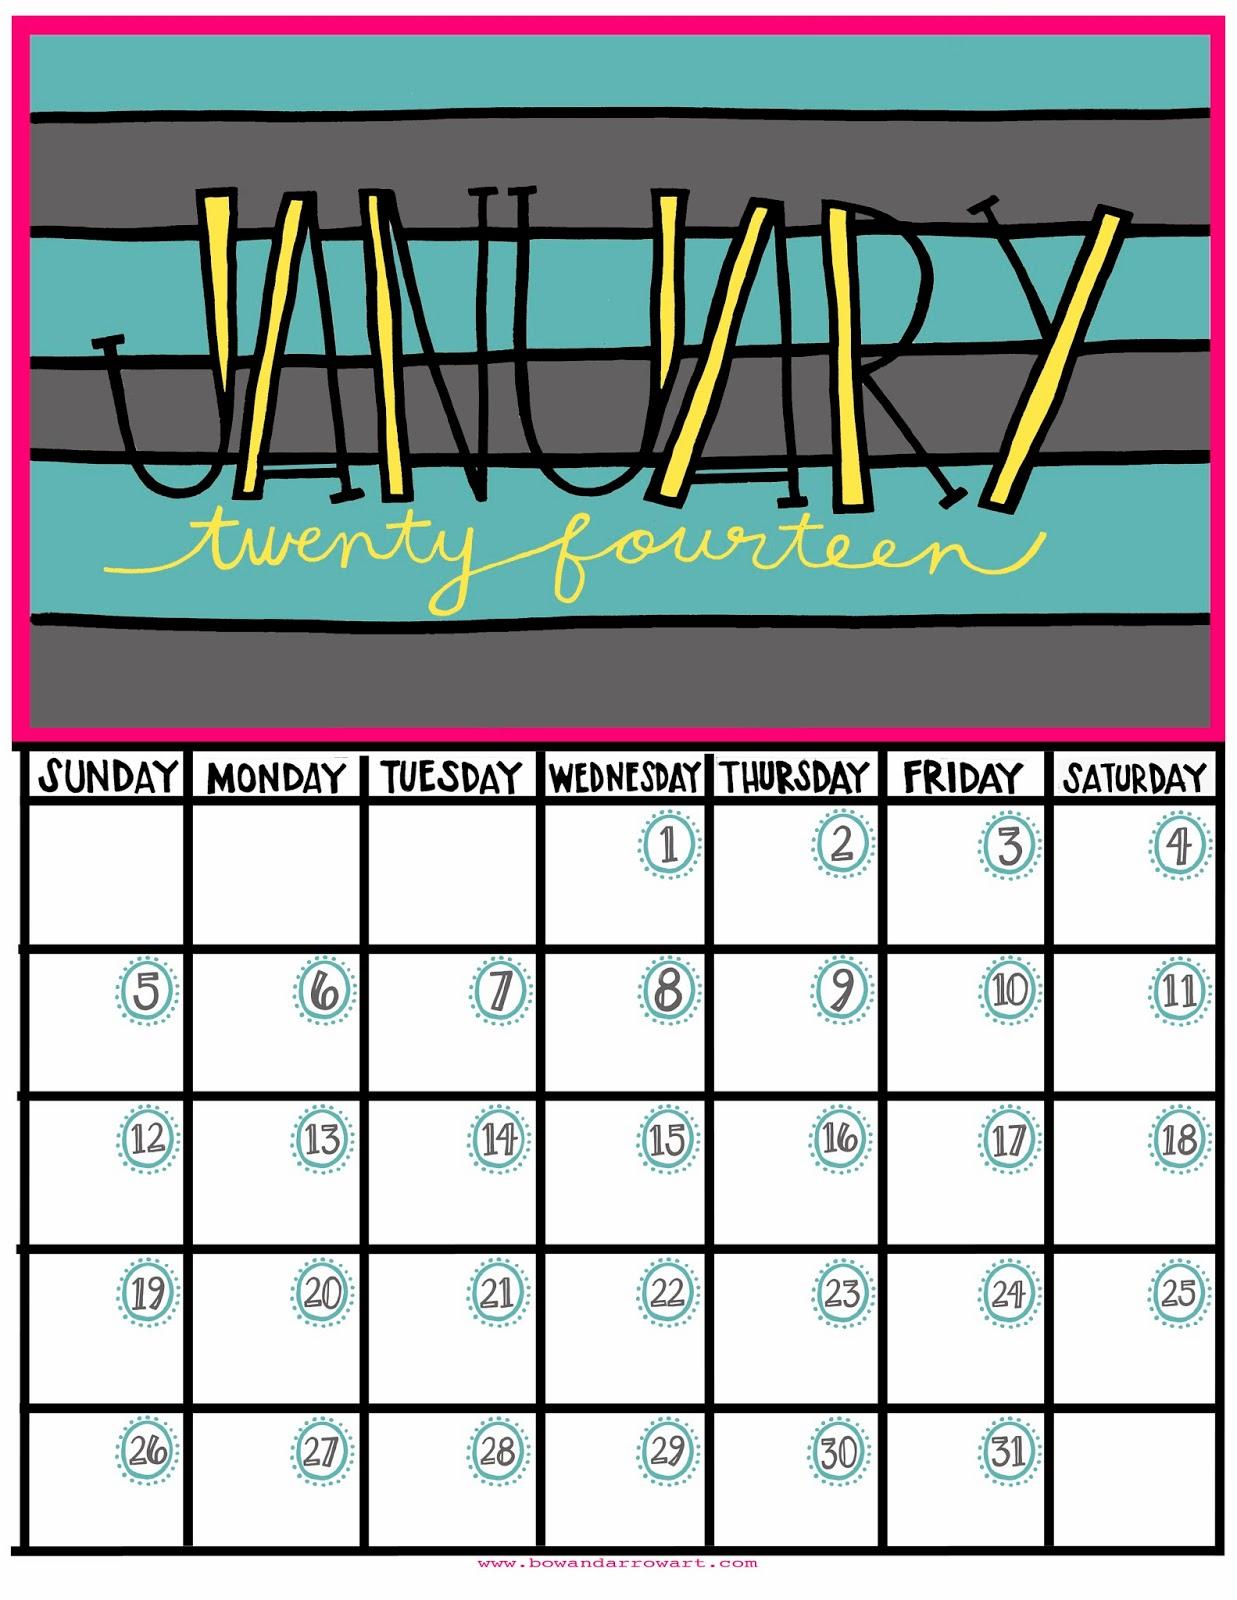 Bow Arrow January Printable Calendar It S Not Too Late